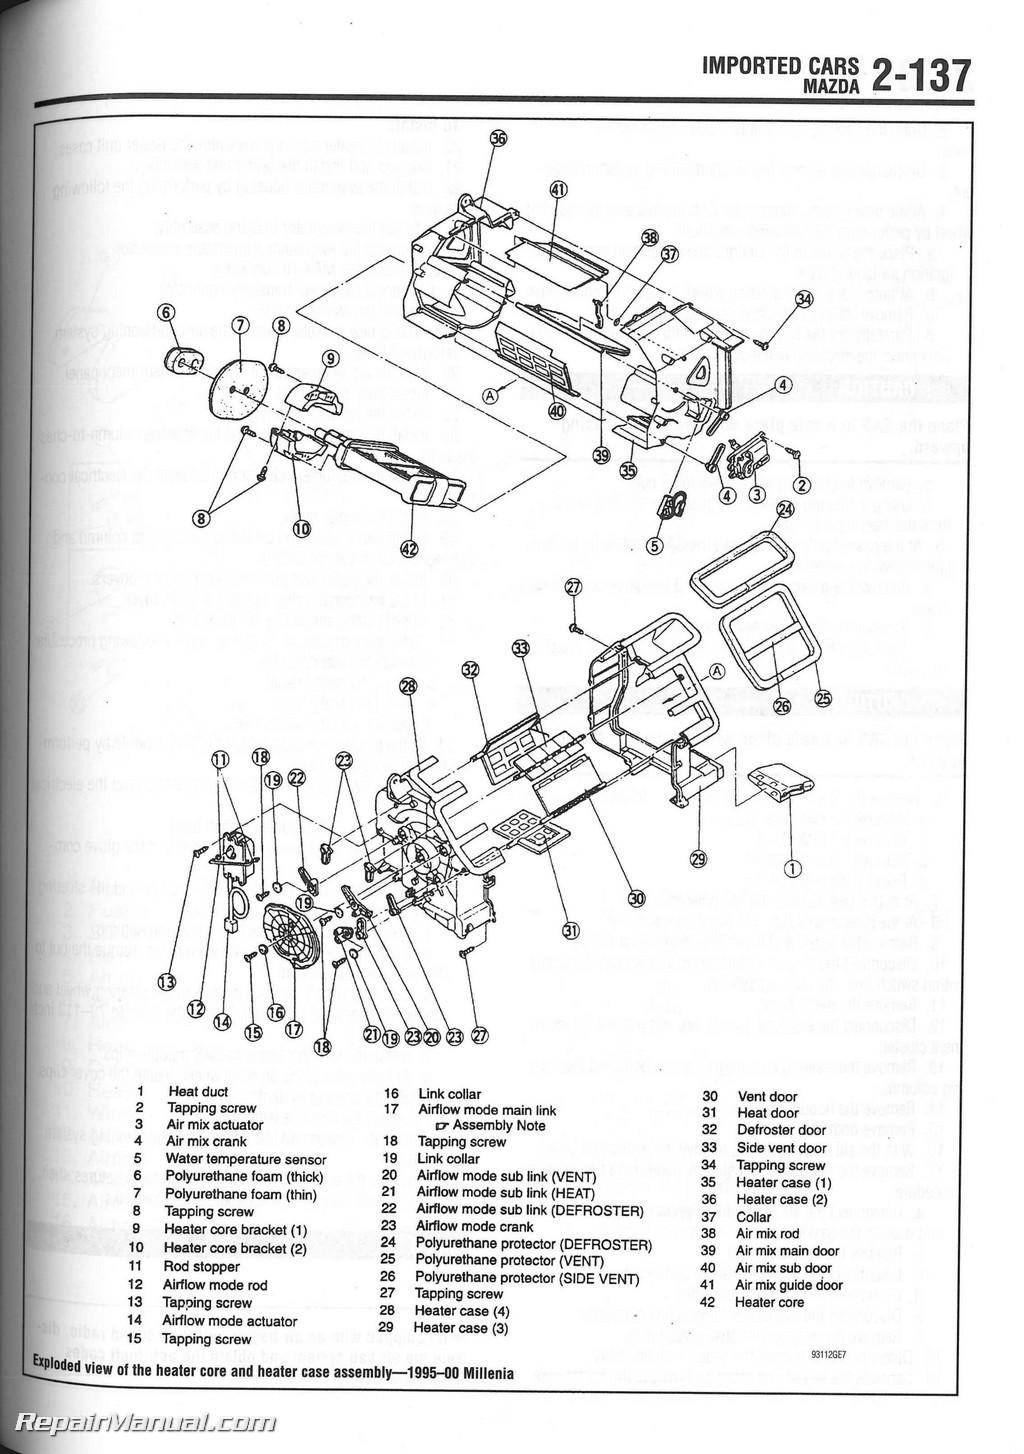 1996 Jeep Cherokee Sport Fuse Box Chilton 1990 2000 Heater Core Installation Manual